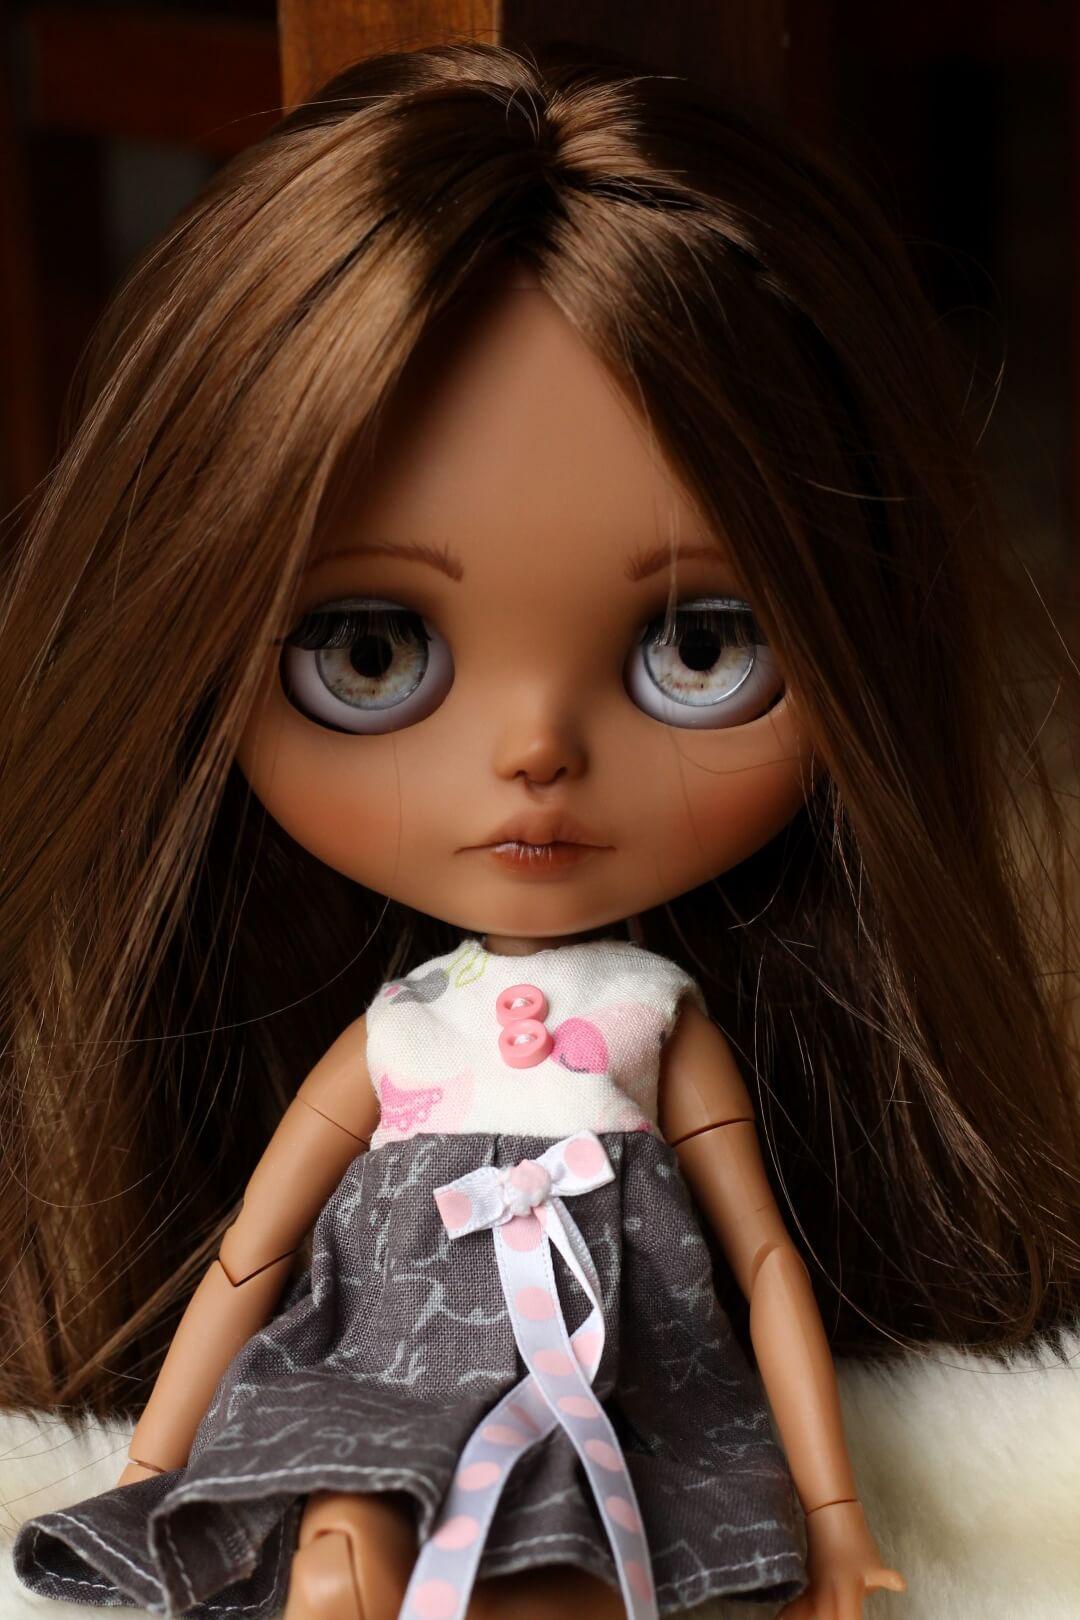 Custom Blythe Doll no 43 Hattie - 15